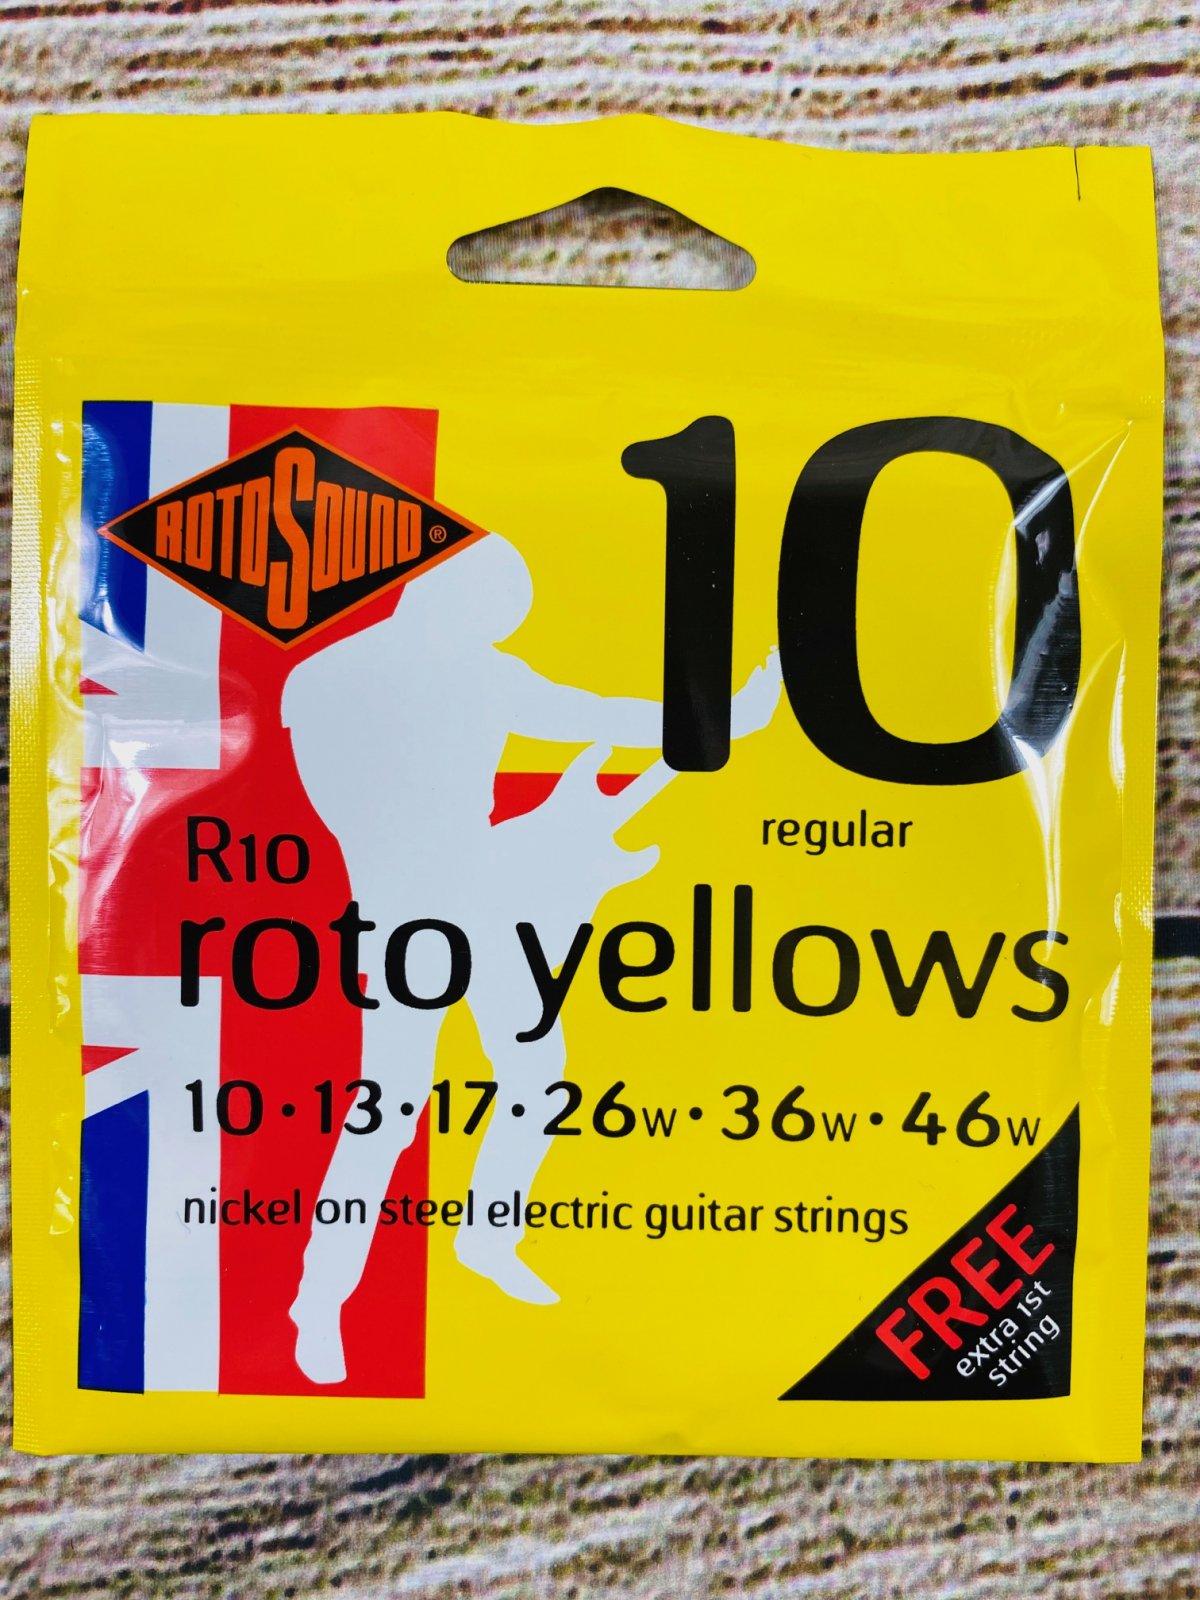 Rotosound R10 Roto Yellows Nickel On Steel Electric Guitar Strings - .010-.046 Regular